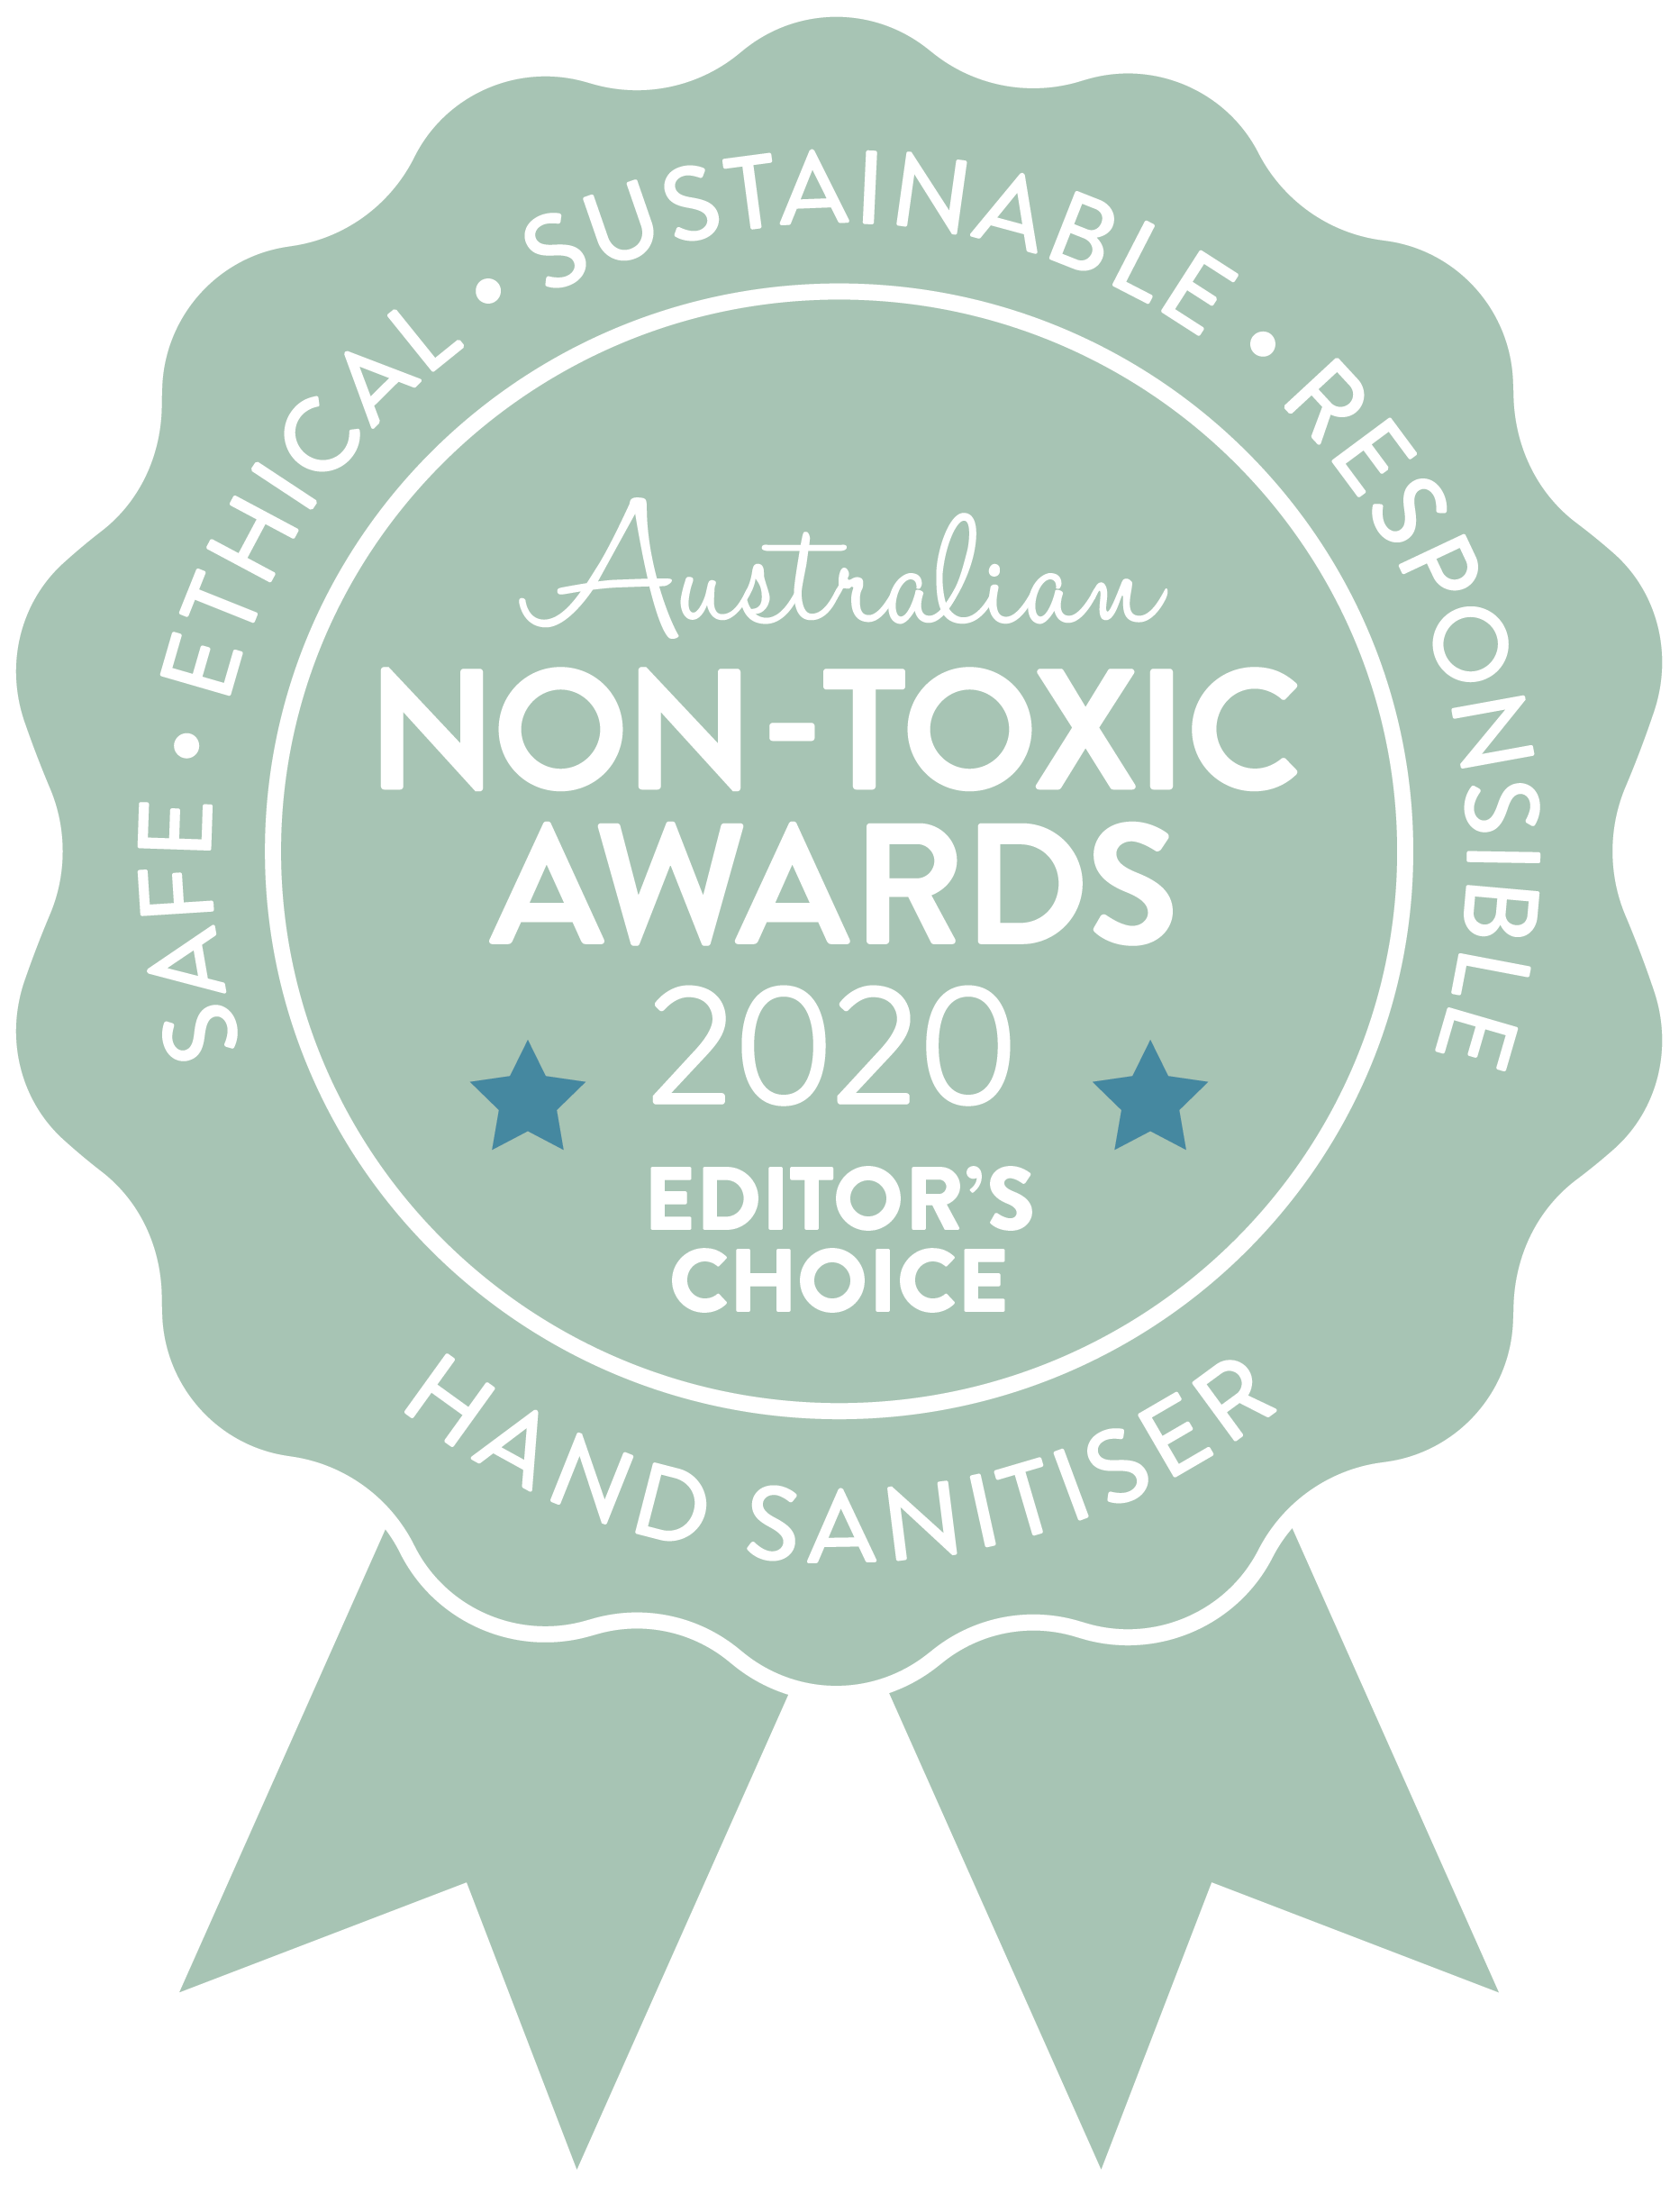 Australian Non-toxic Awards 2020 Editor's choise Hand Sanitiser